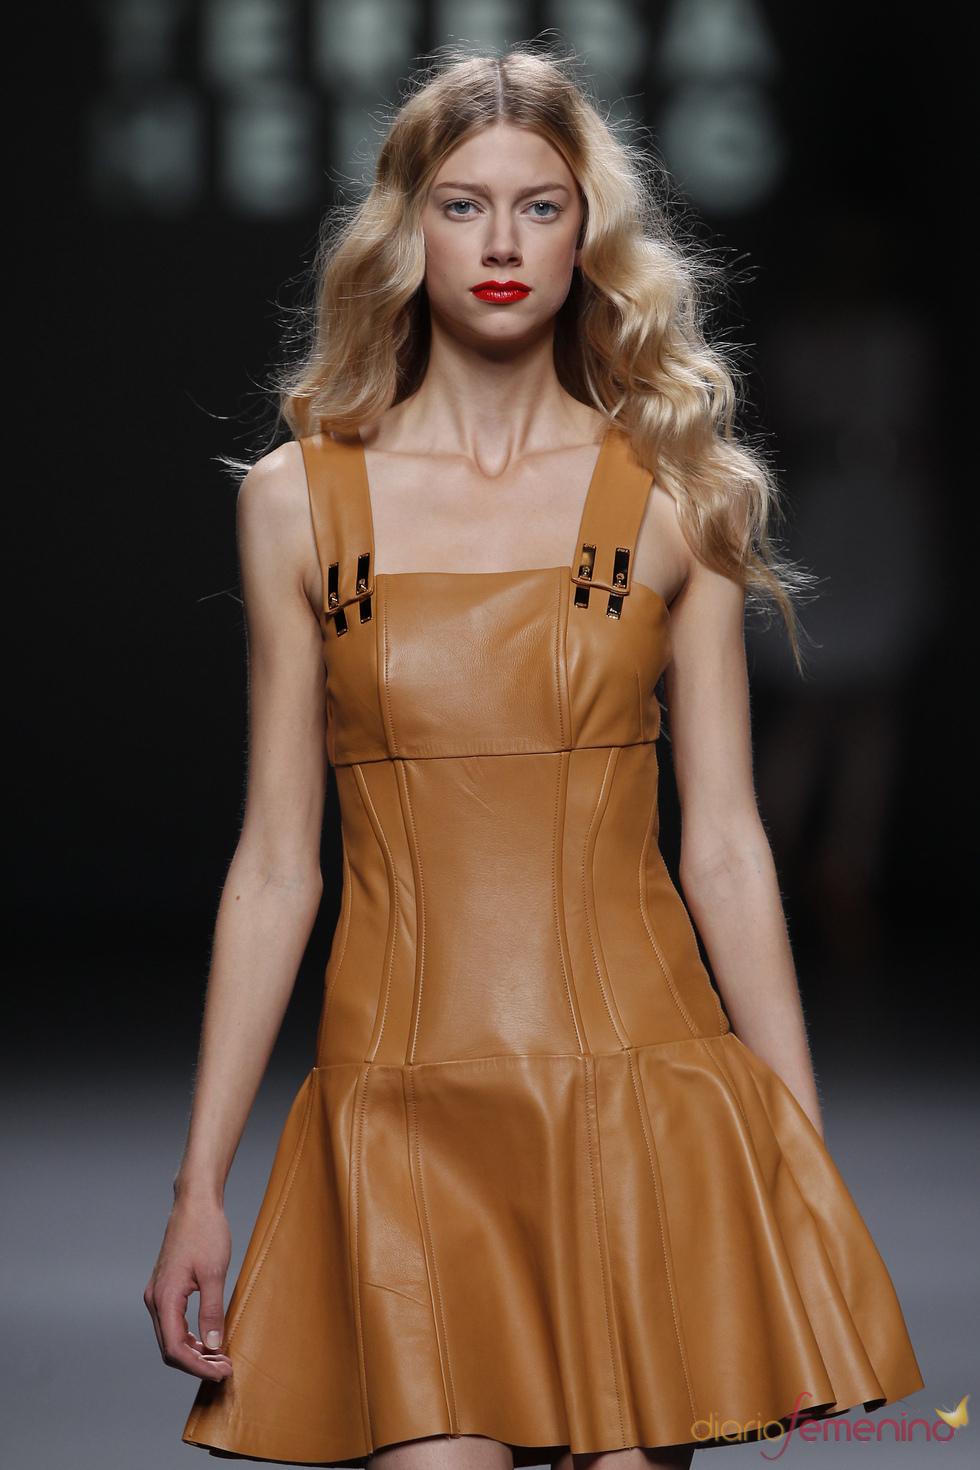 El cuero se adapta a la figura femenina en la Madrid Fashion Week